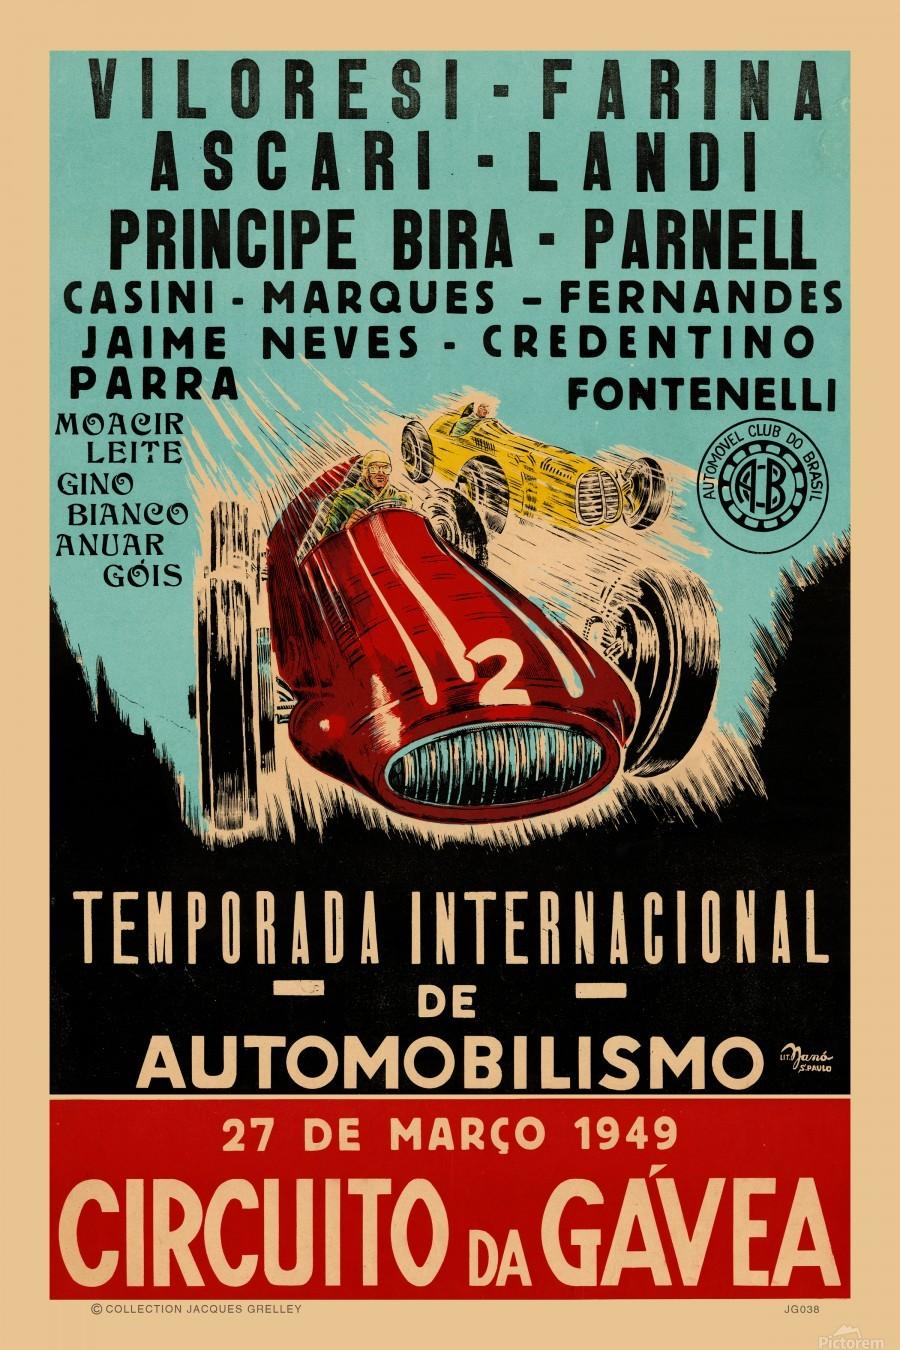 Gavea Circuit Circuito Gavea 1949 Temporada Internacional De Automobilisimo 1949  Print